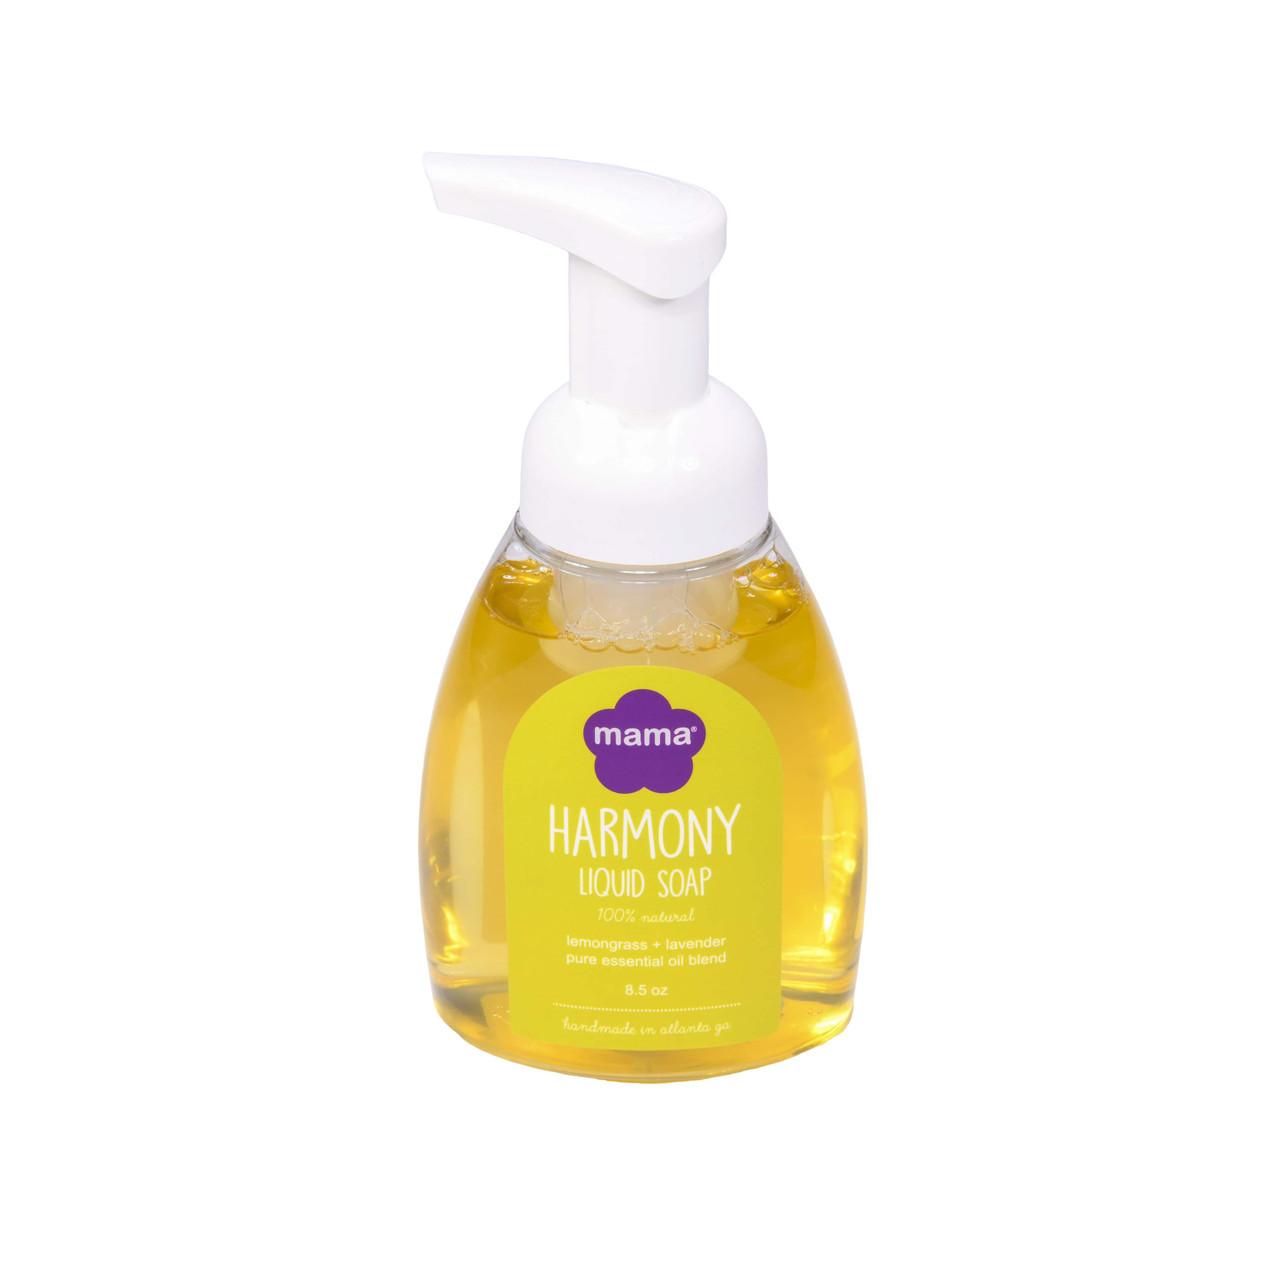 Harmony (Lavender + Lemongrass) Liquid Soap   Mama Bath + Body